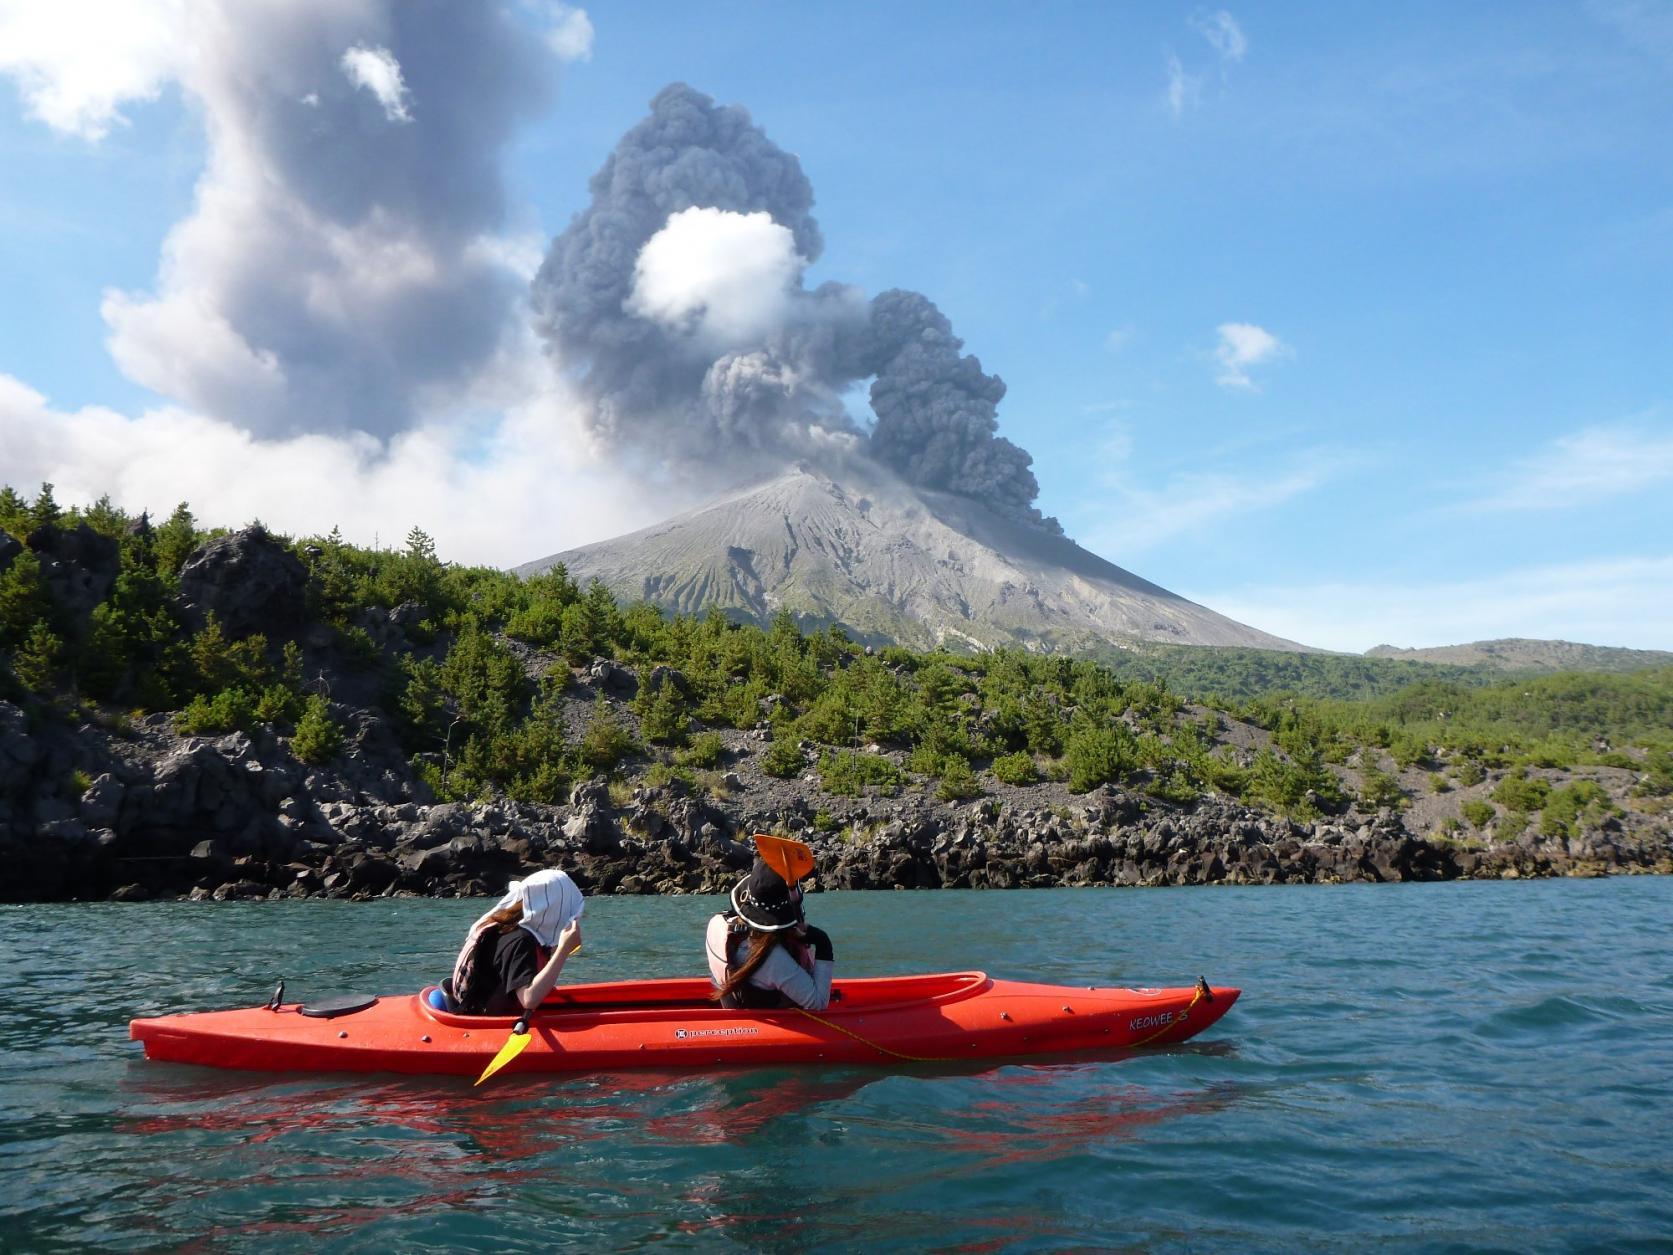 【Kagoshima Kayaks】皮艇  樱岛皮艇半日游-1